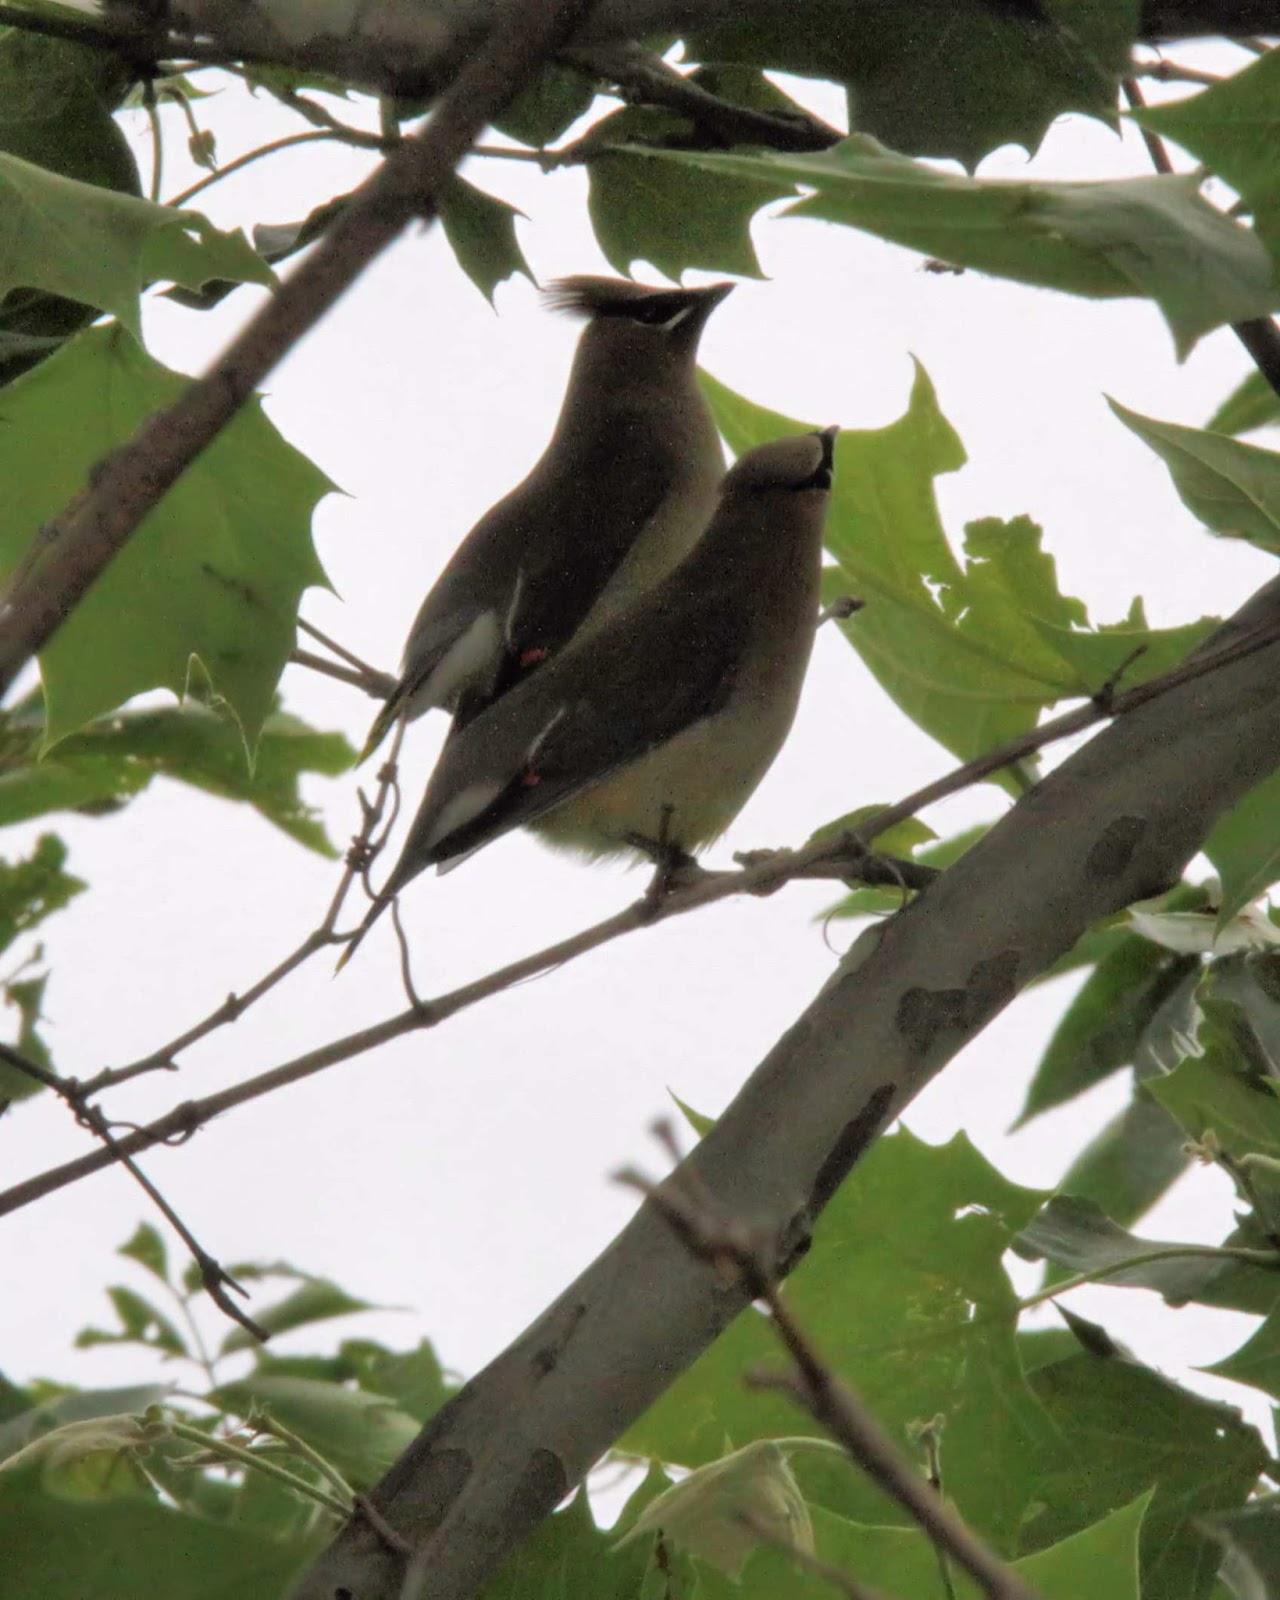 Birds from Behind : 16 June 2013